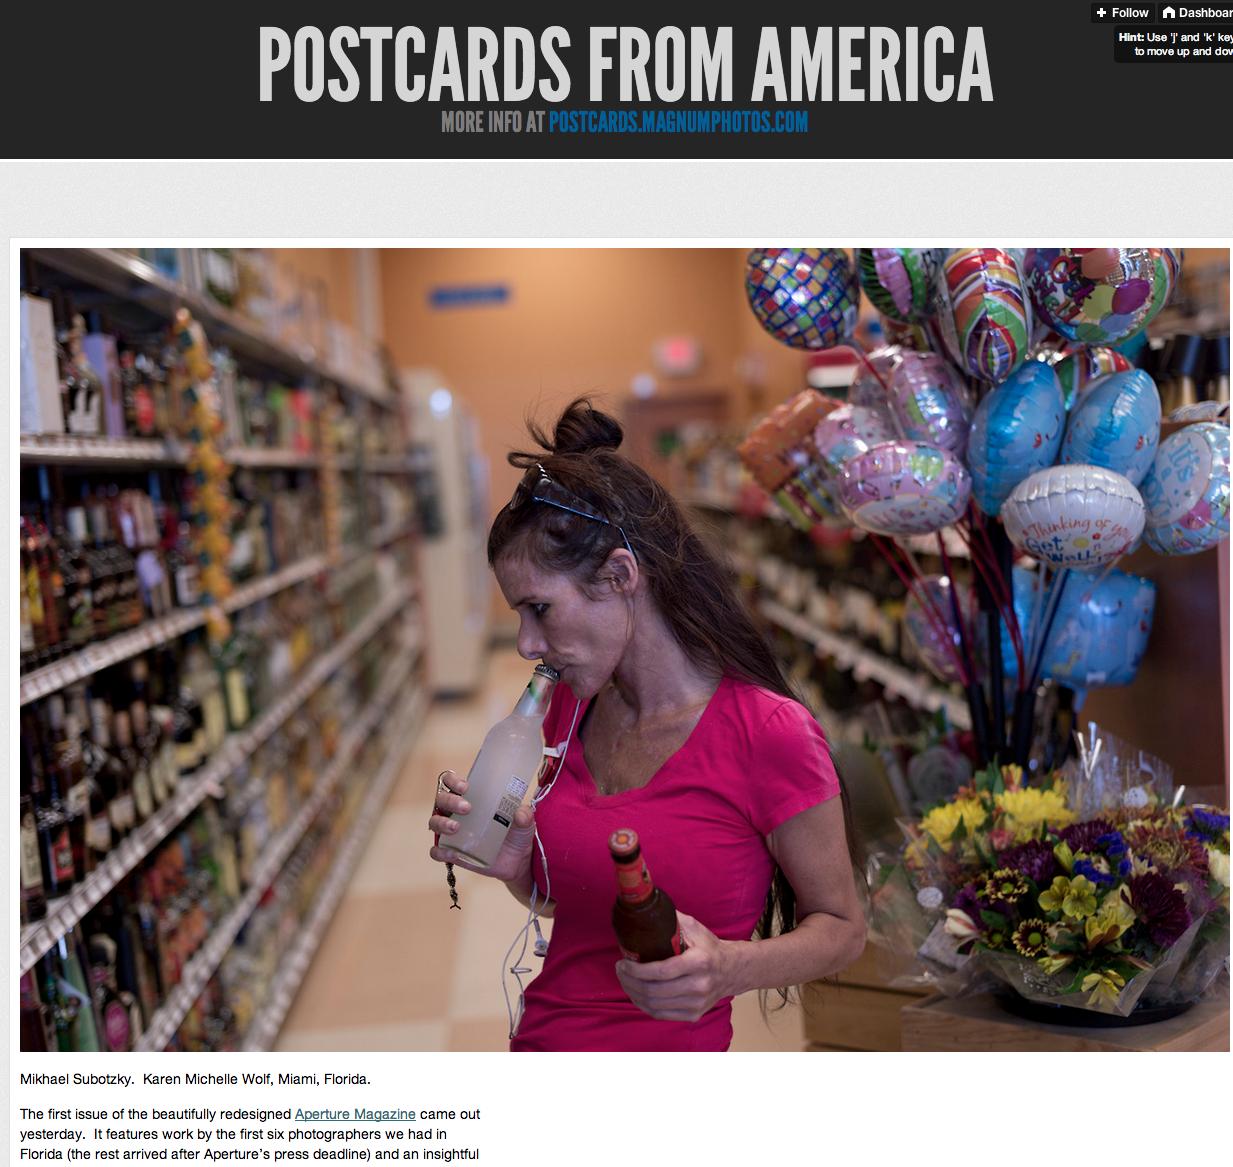 Postcards From America -http://postcardsfromamerica.tumblr.com/